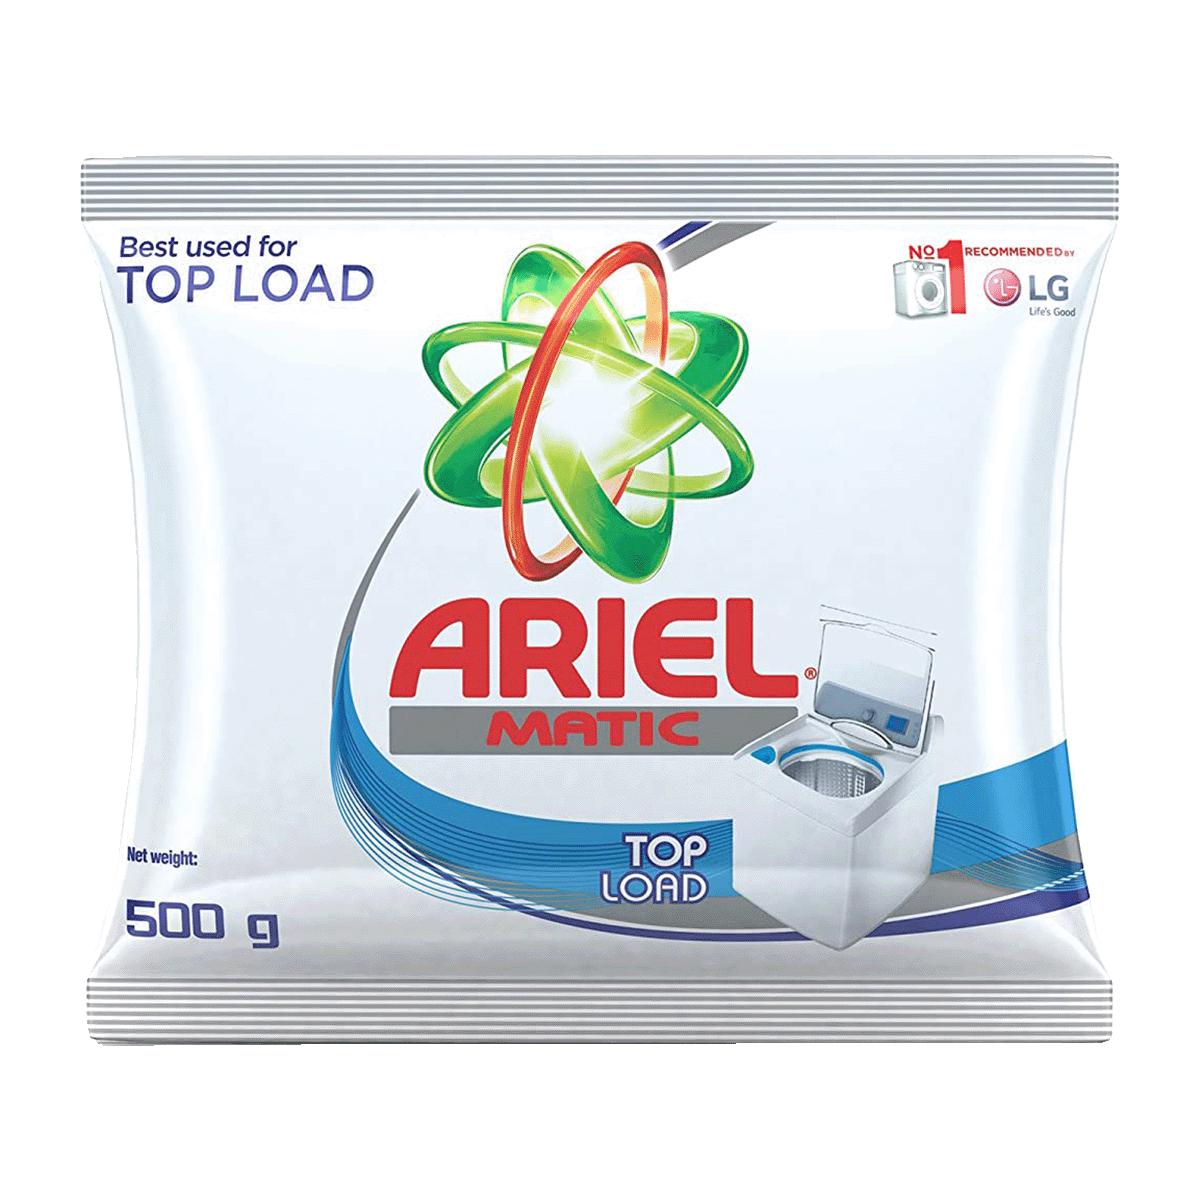 Ariel Matic Front Load 500gm detergent_1